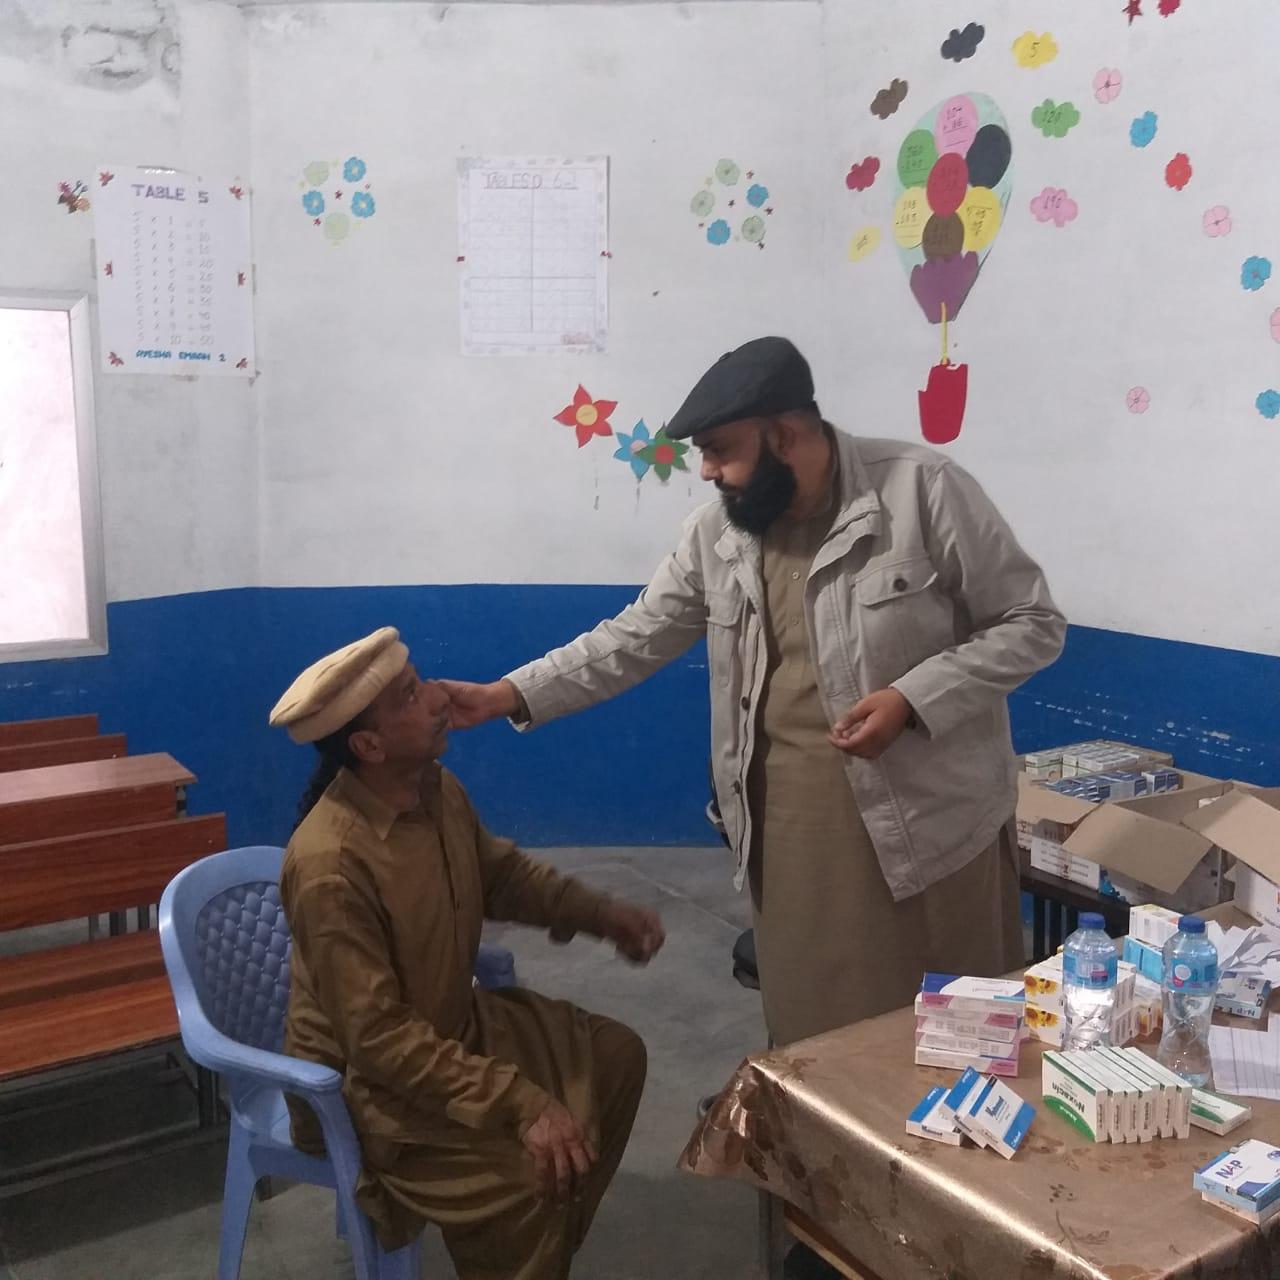 Zilah Chakwal ke ilaqa کھوکھرزیر mein aik roza free medical camp - 2